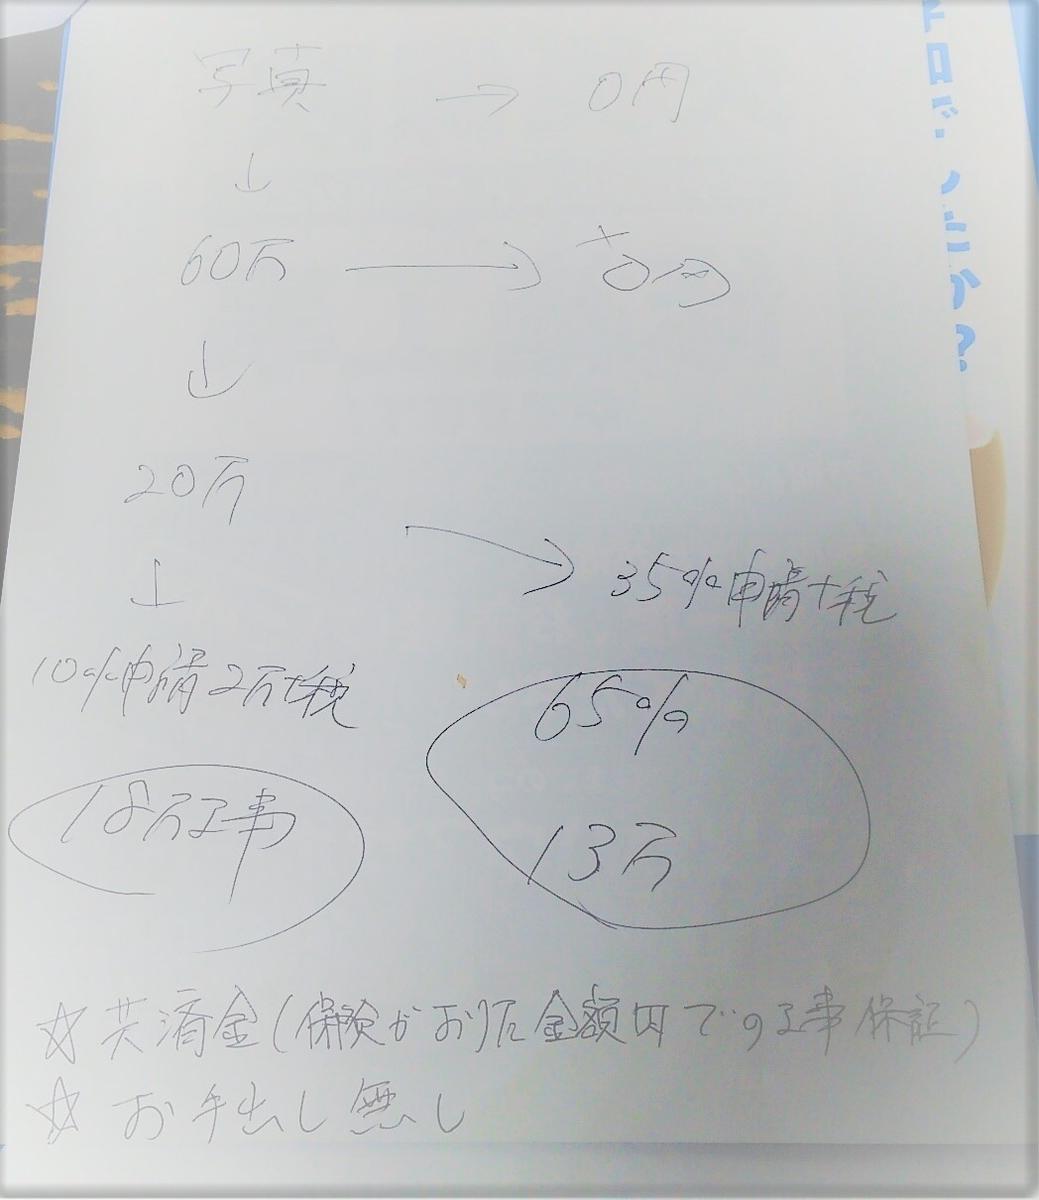 f:id:yotsumao:20190519184922j:plain